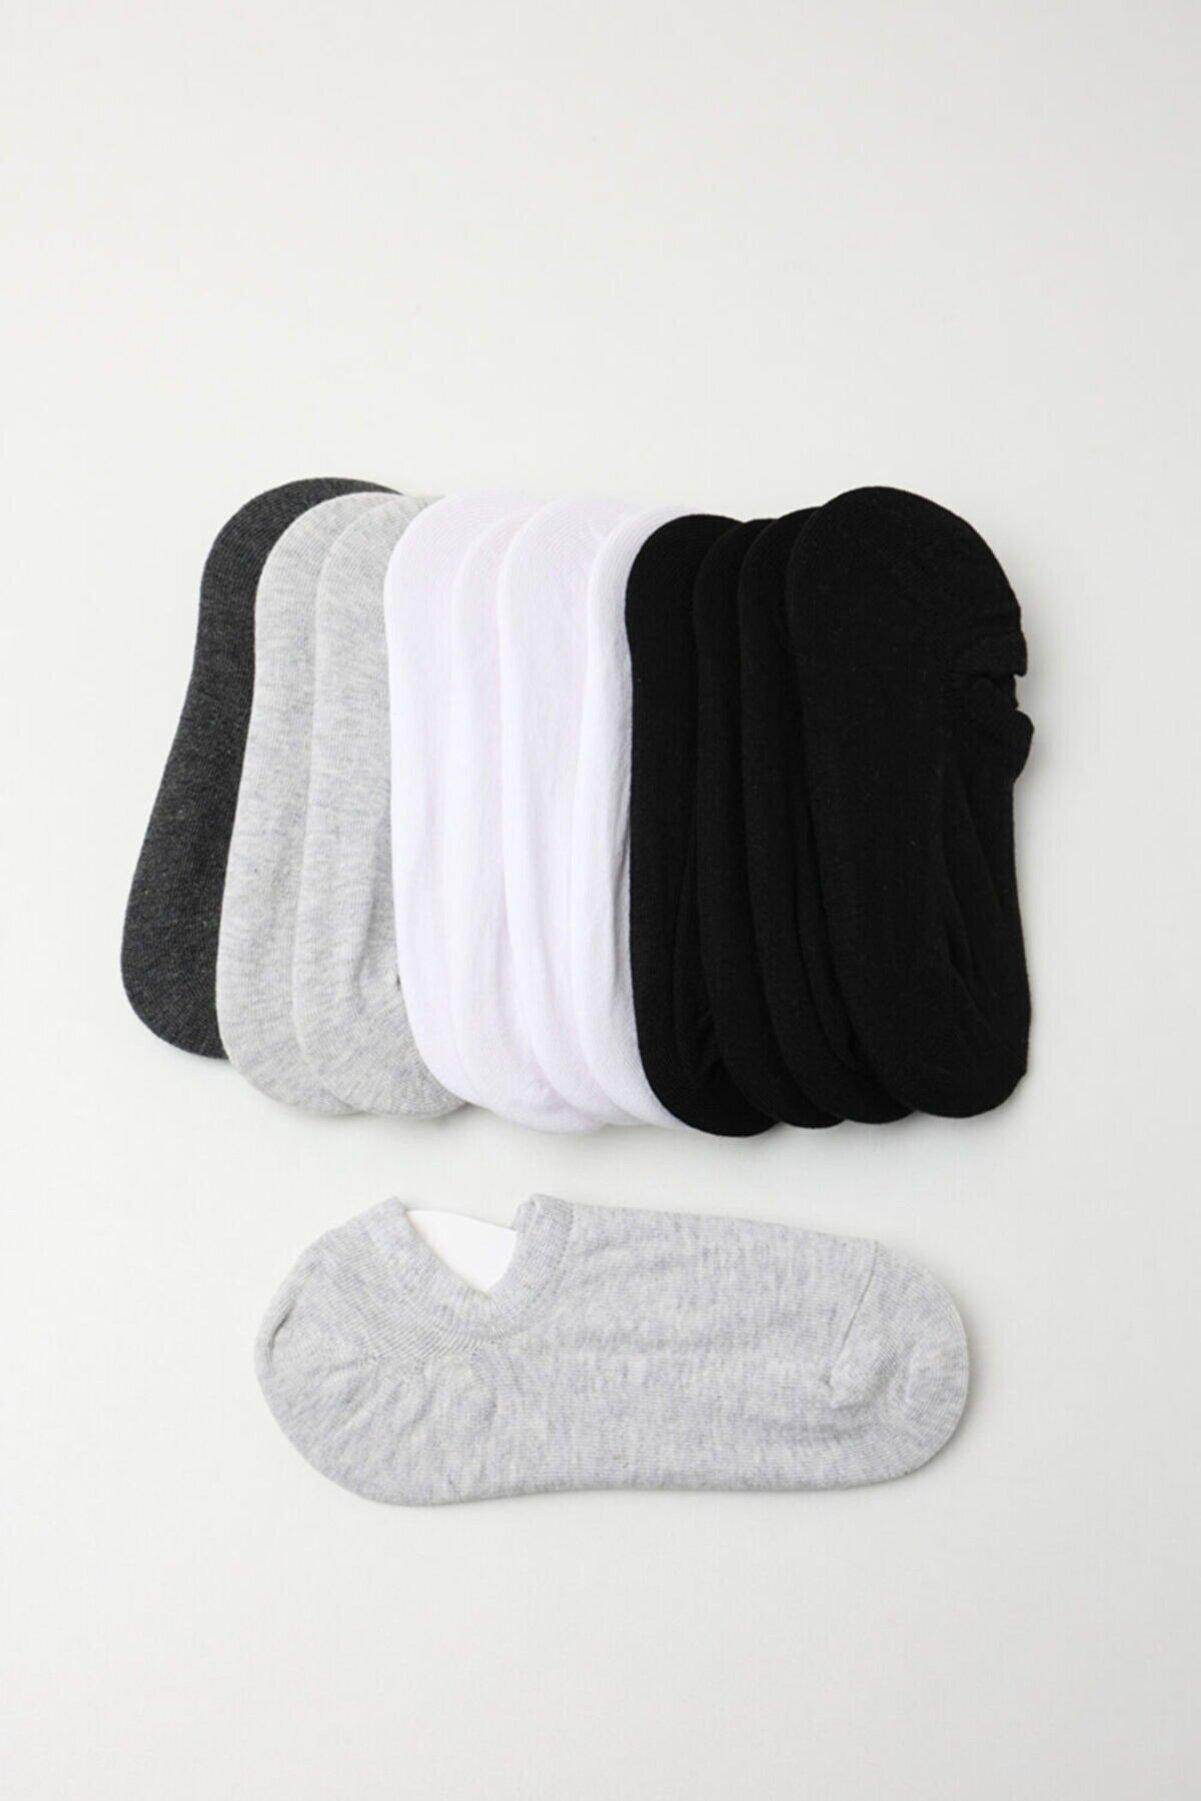 Katia & Bony Kadın Spor Çorap - Siyah /beyaz / Gri 12'li Paket